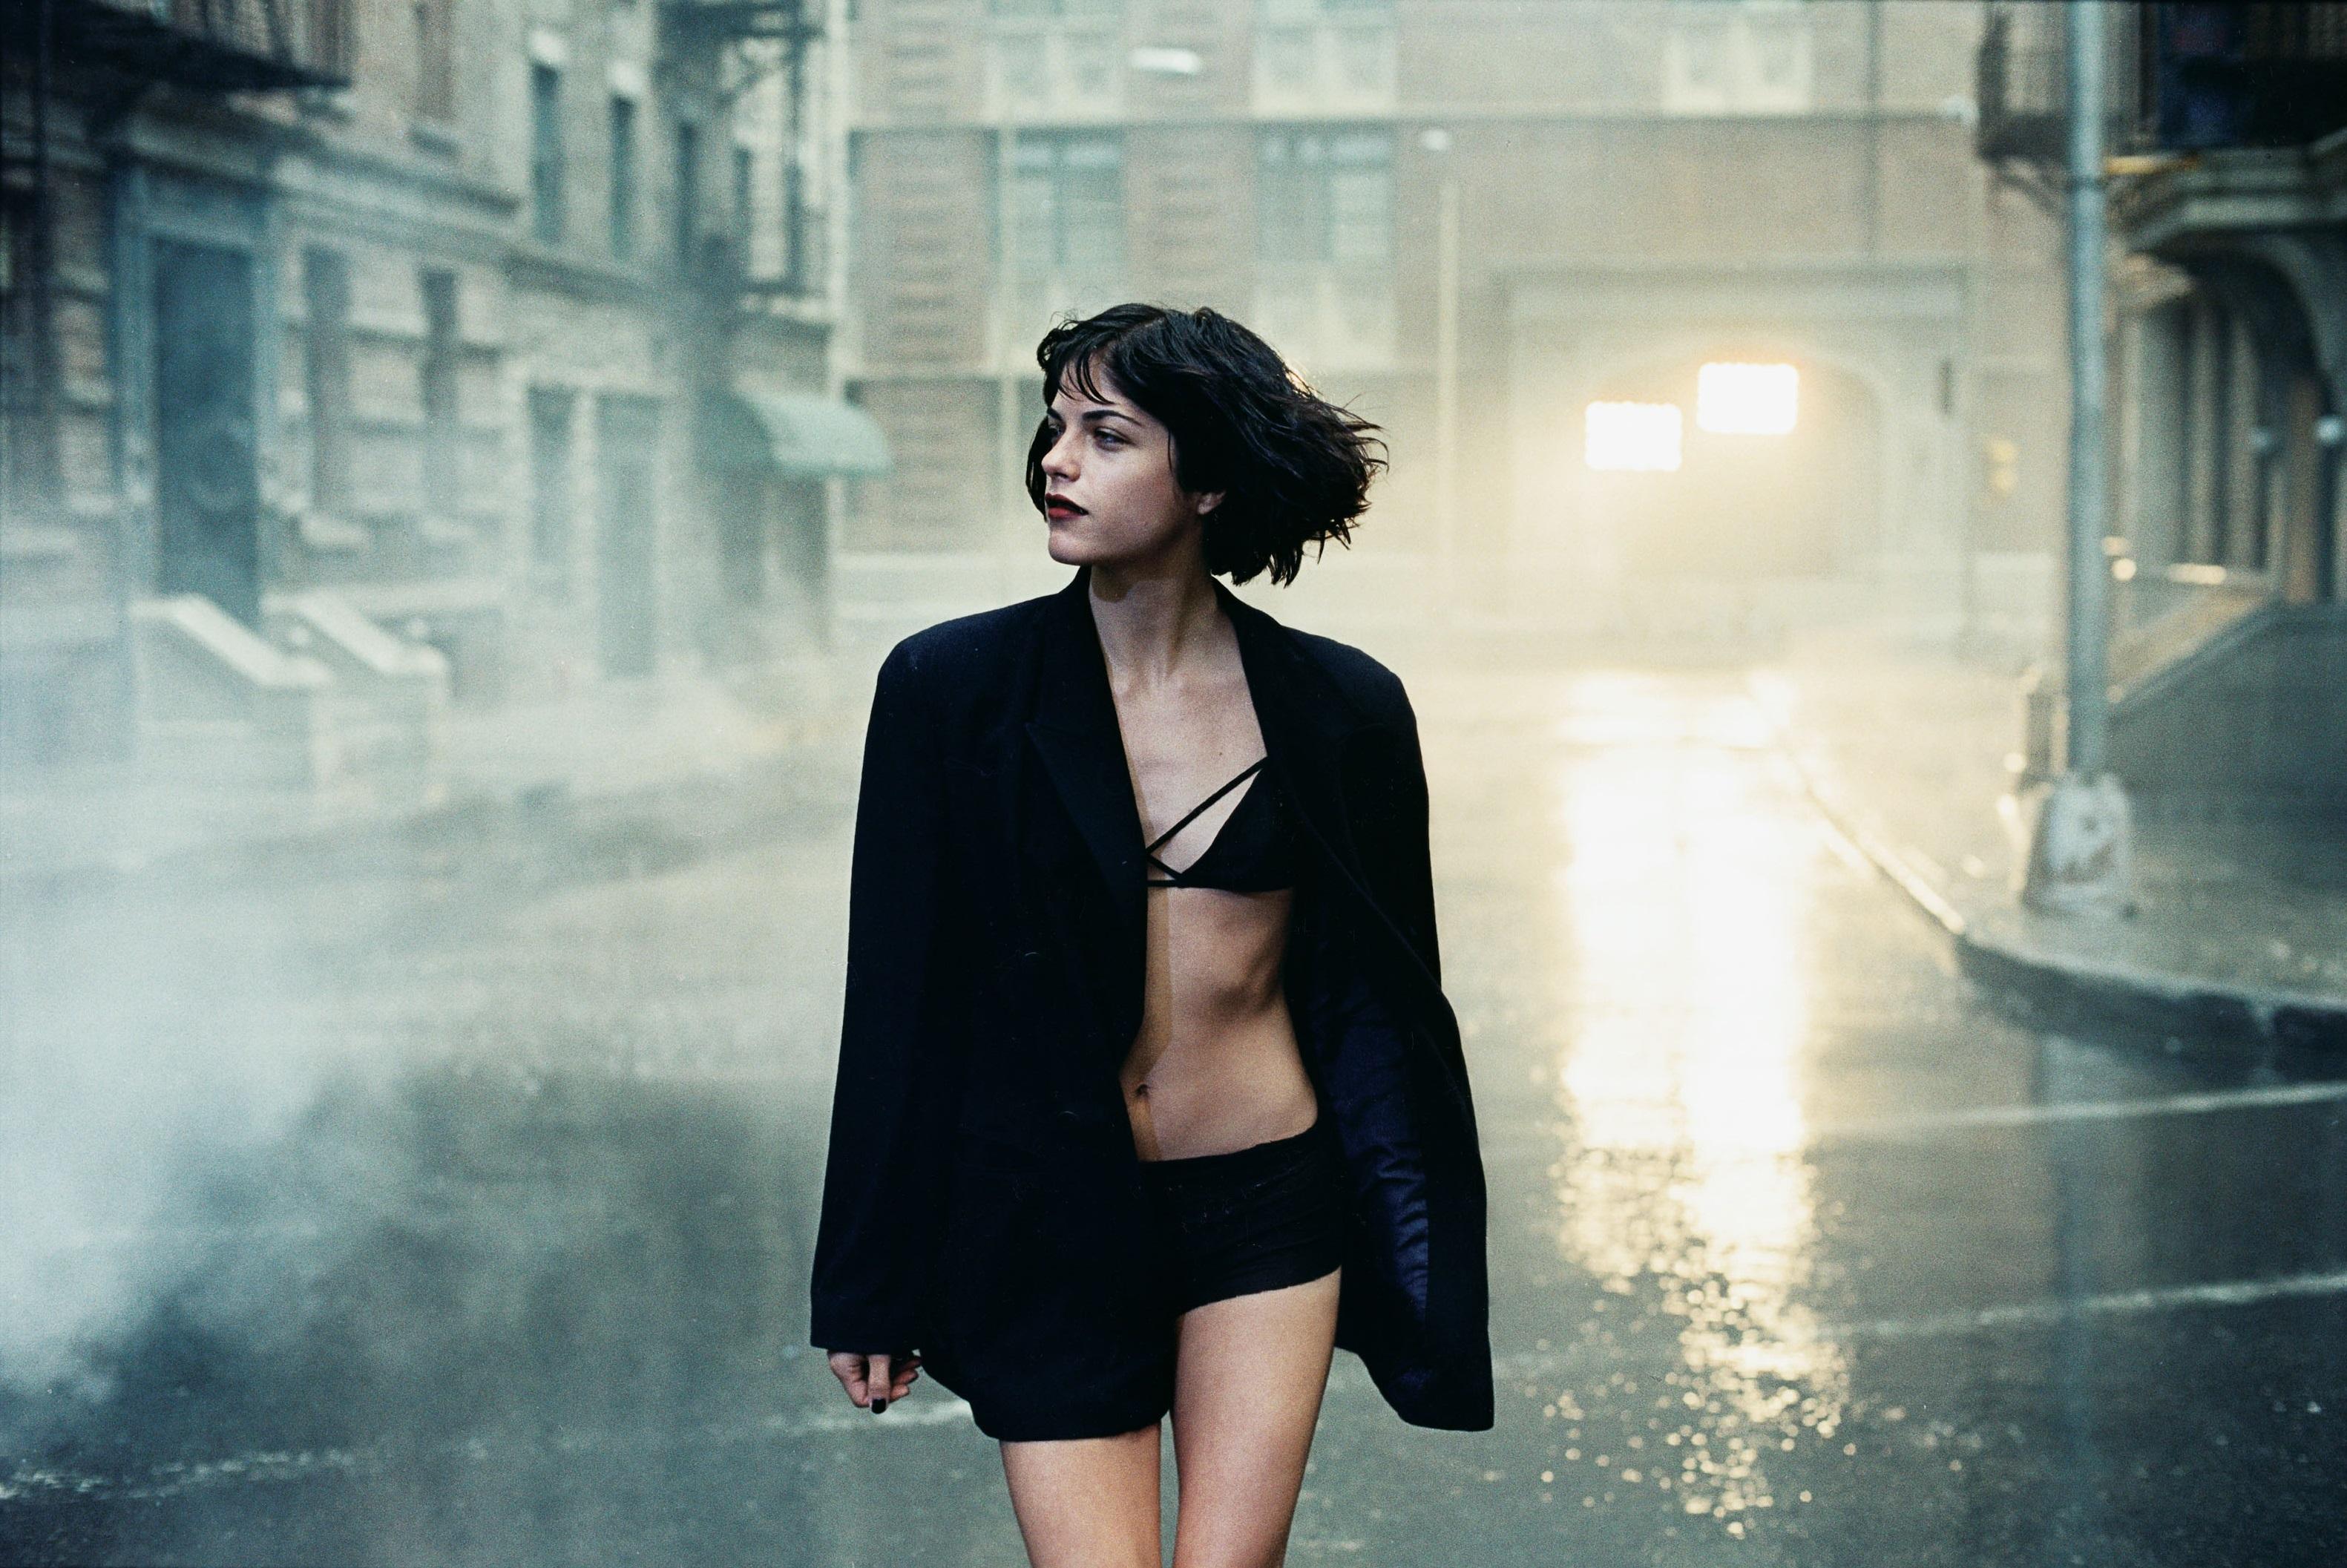 naked (93 photos), Hot Celebrites pic